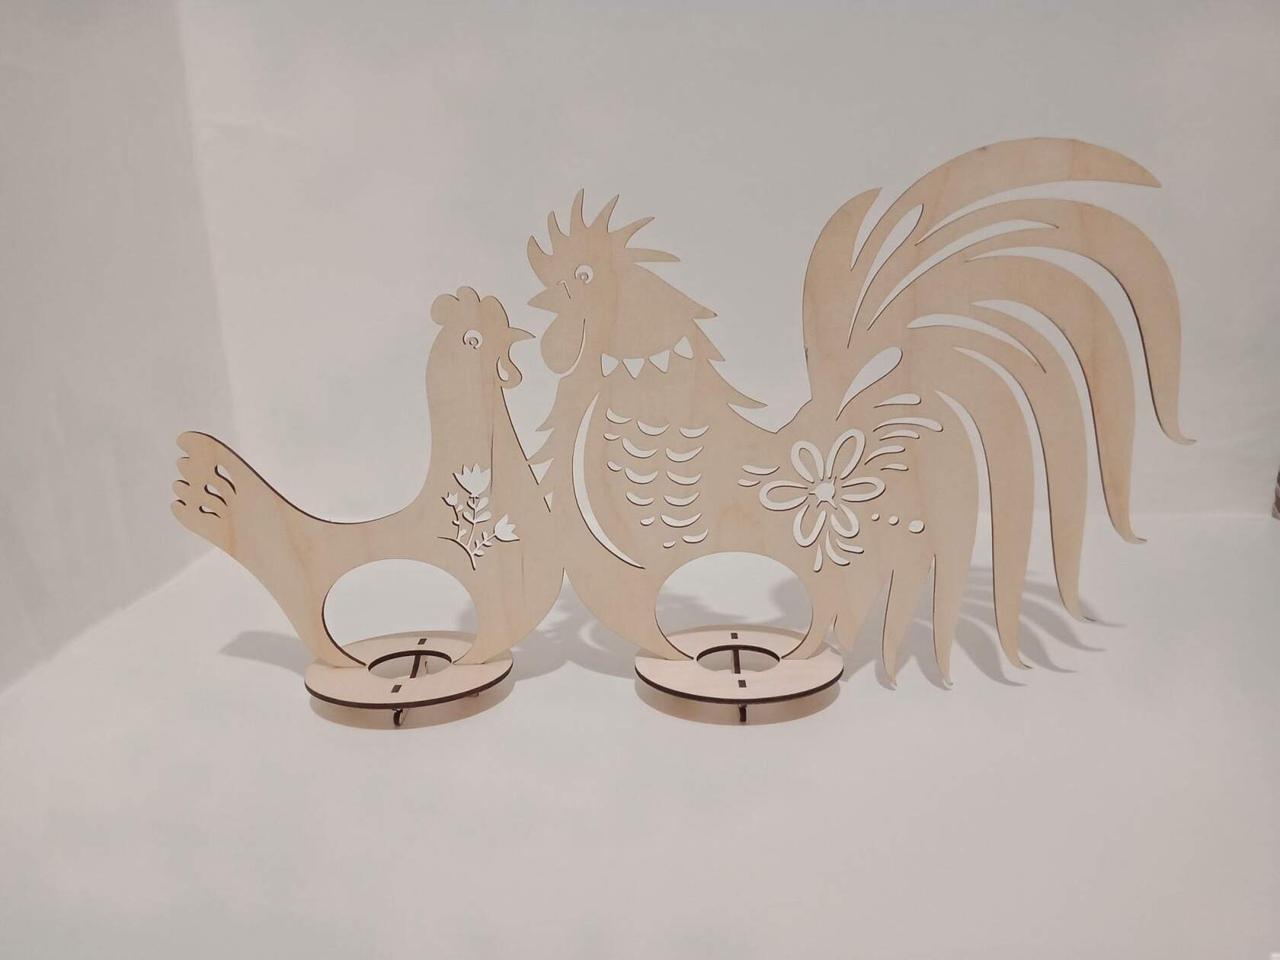 Wooden Hen Rooster Easter Egg Holder Laser Cutting Template Free Vector